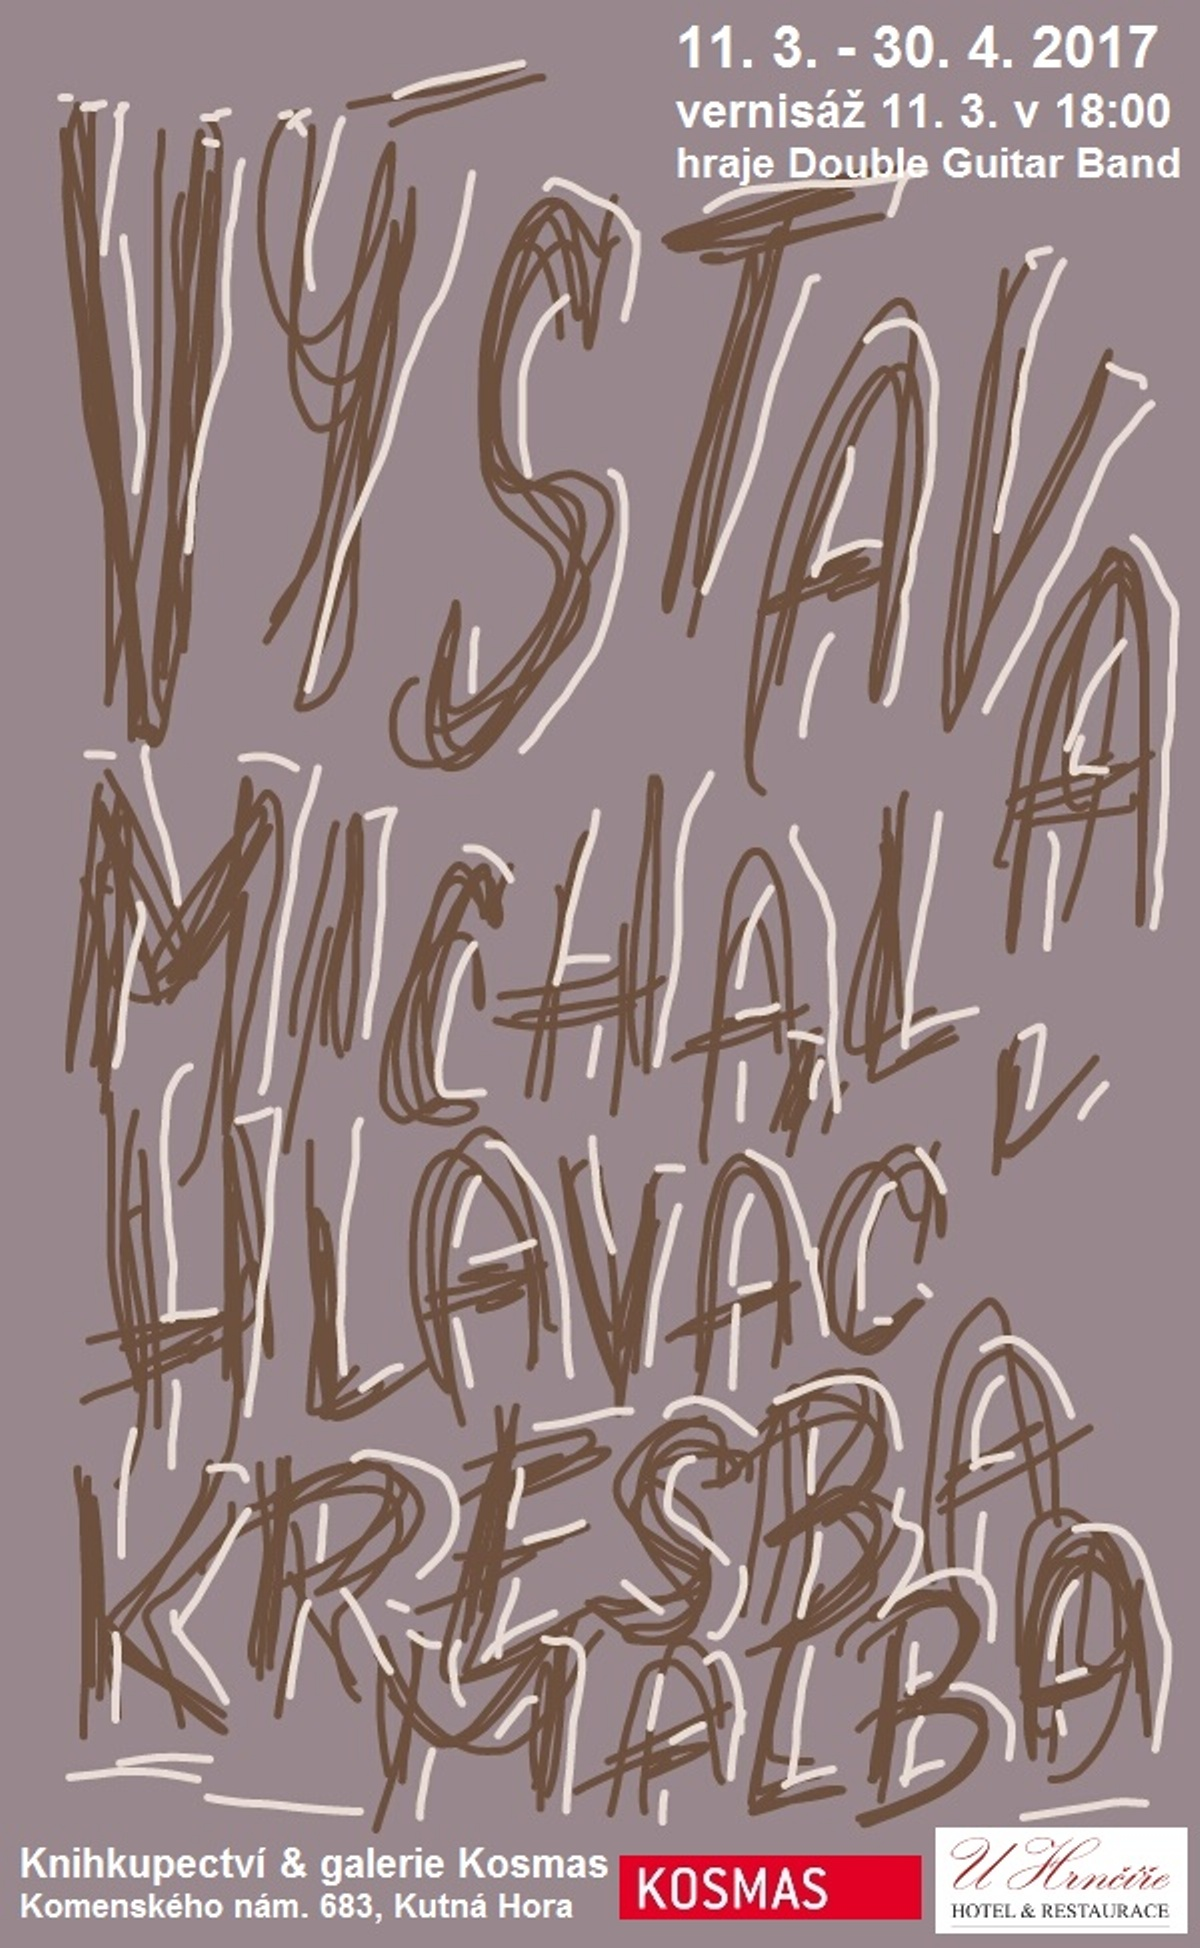 1540-michal-hlavac-kosmas.jpg